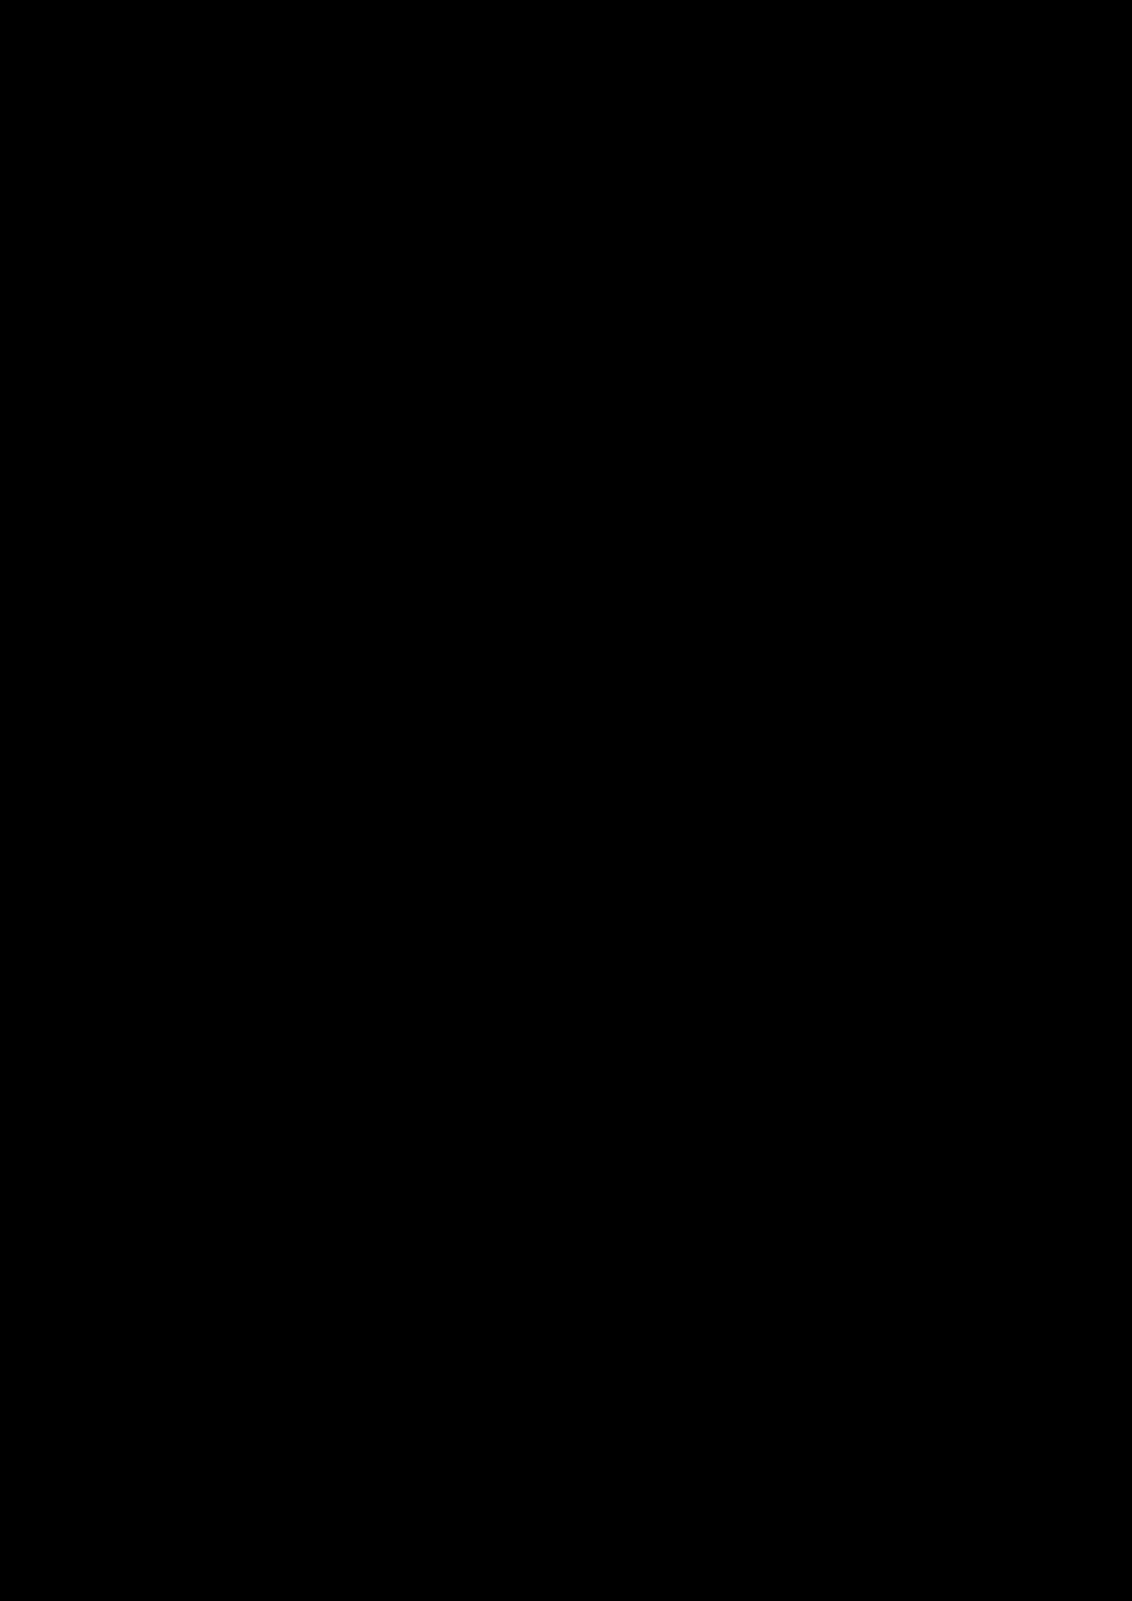 CHujina slide, Image 10